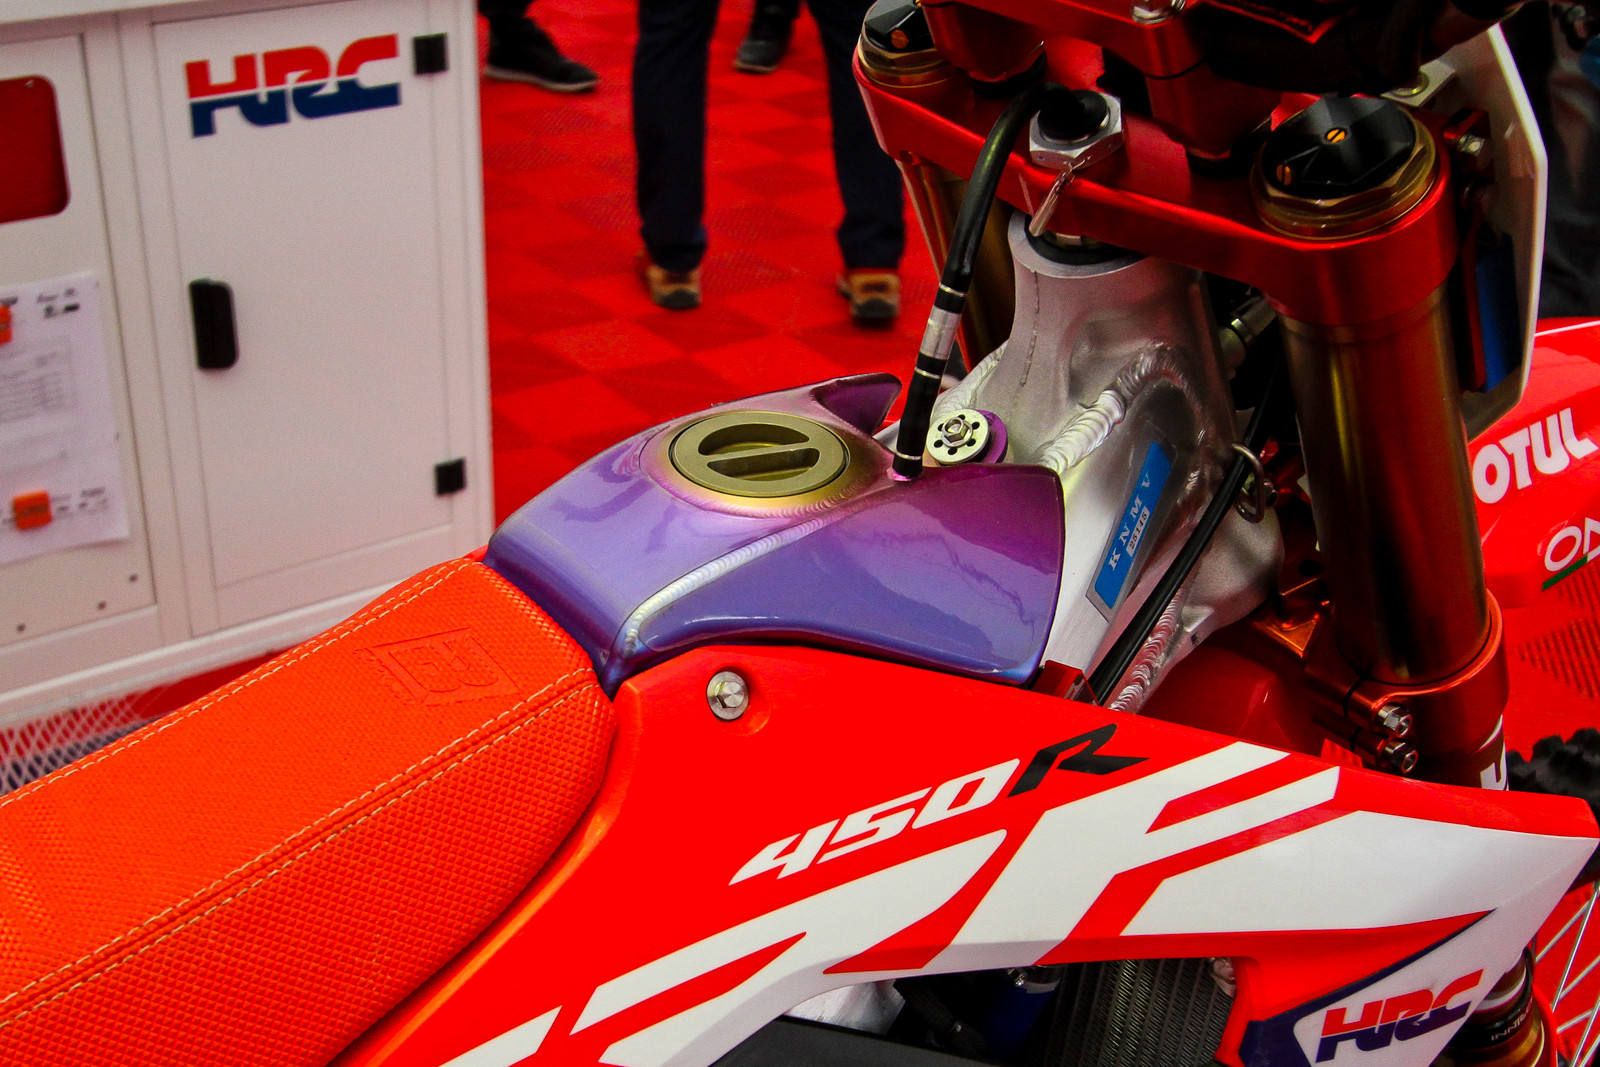 Titanium Fuel Tank and Spring Forks - Vital MX Pit Bits: 2017 MXGP of Valkenswaard - Motocross Pictures - Vital MX